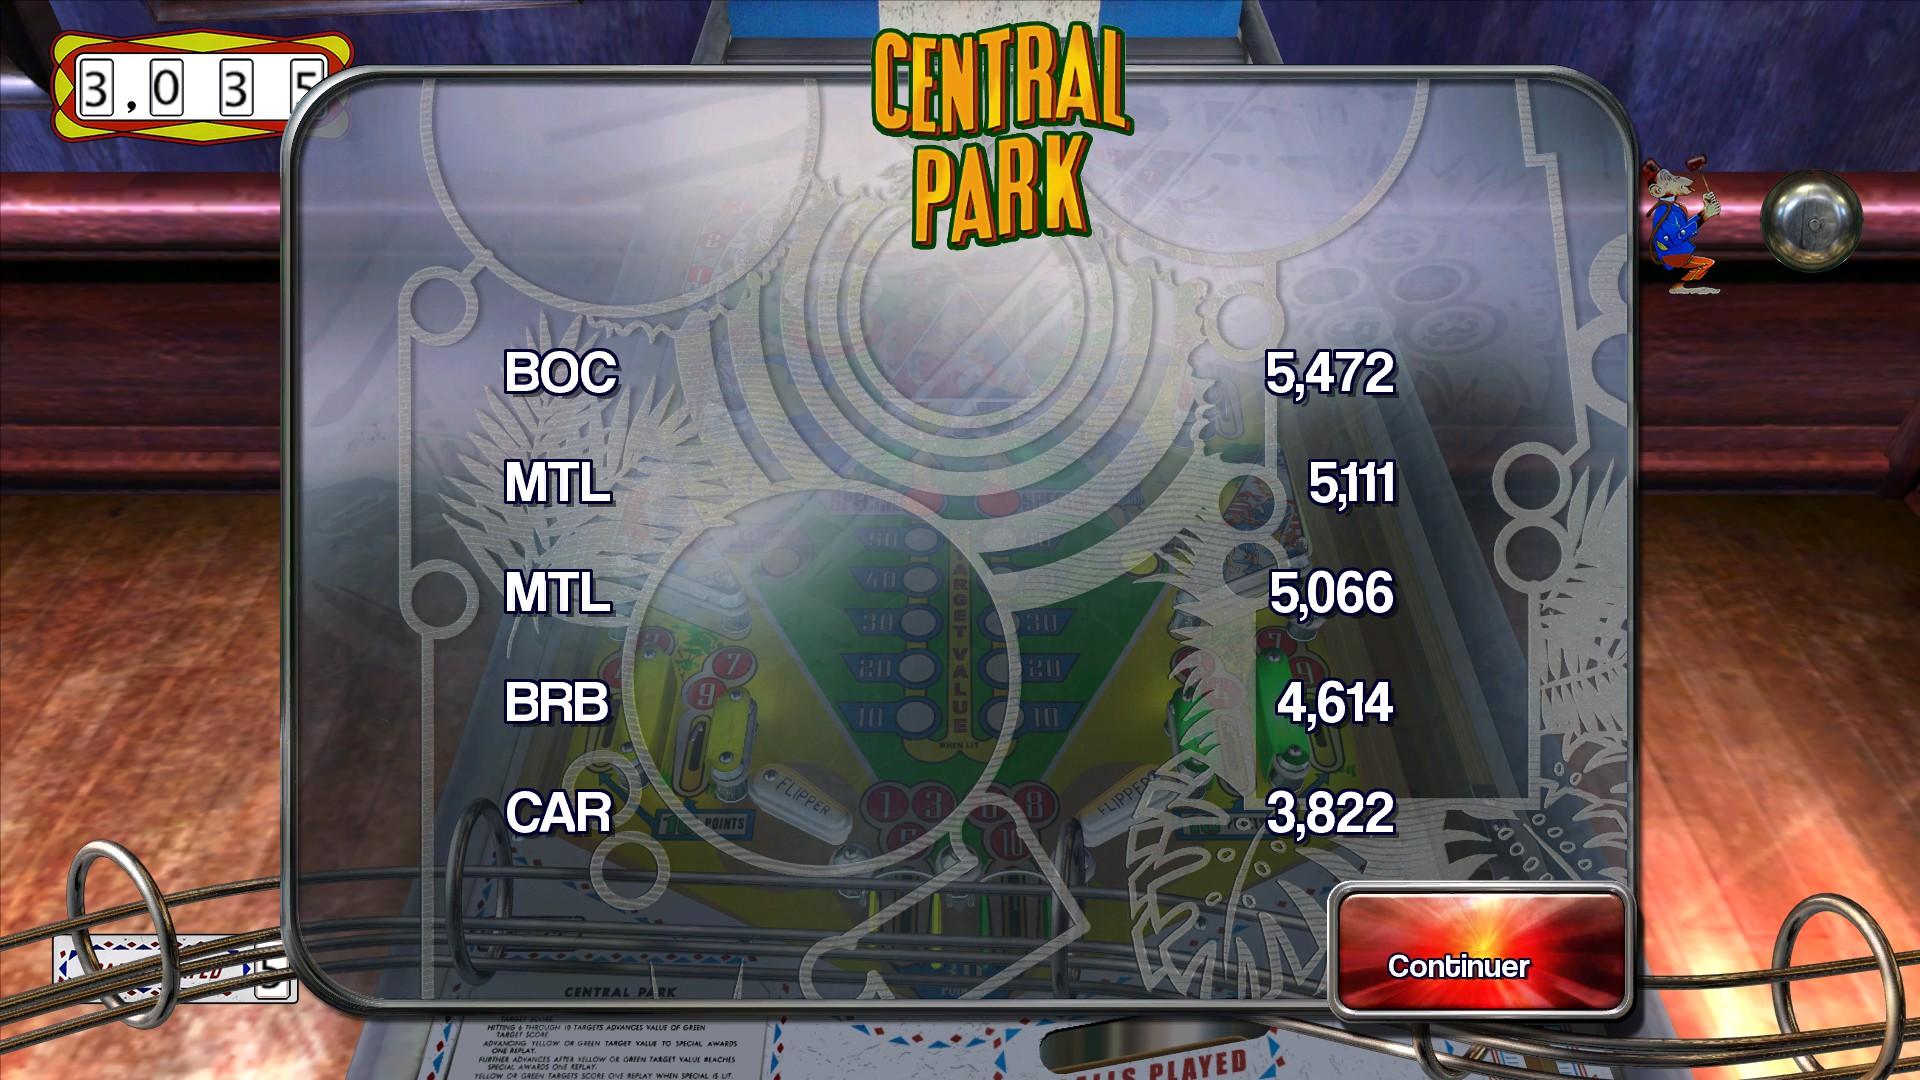 Mantalow: Pinball Arcade: Central Park (PC) 5,111 points on 2015-07-03 03:50:09